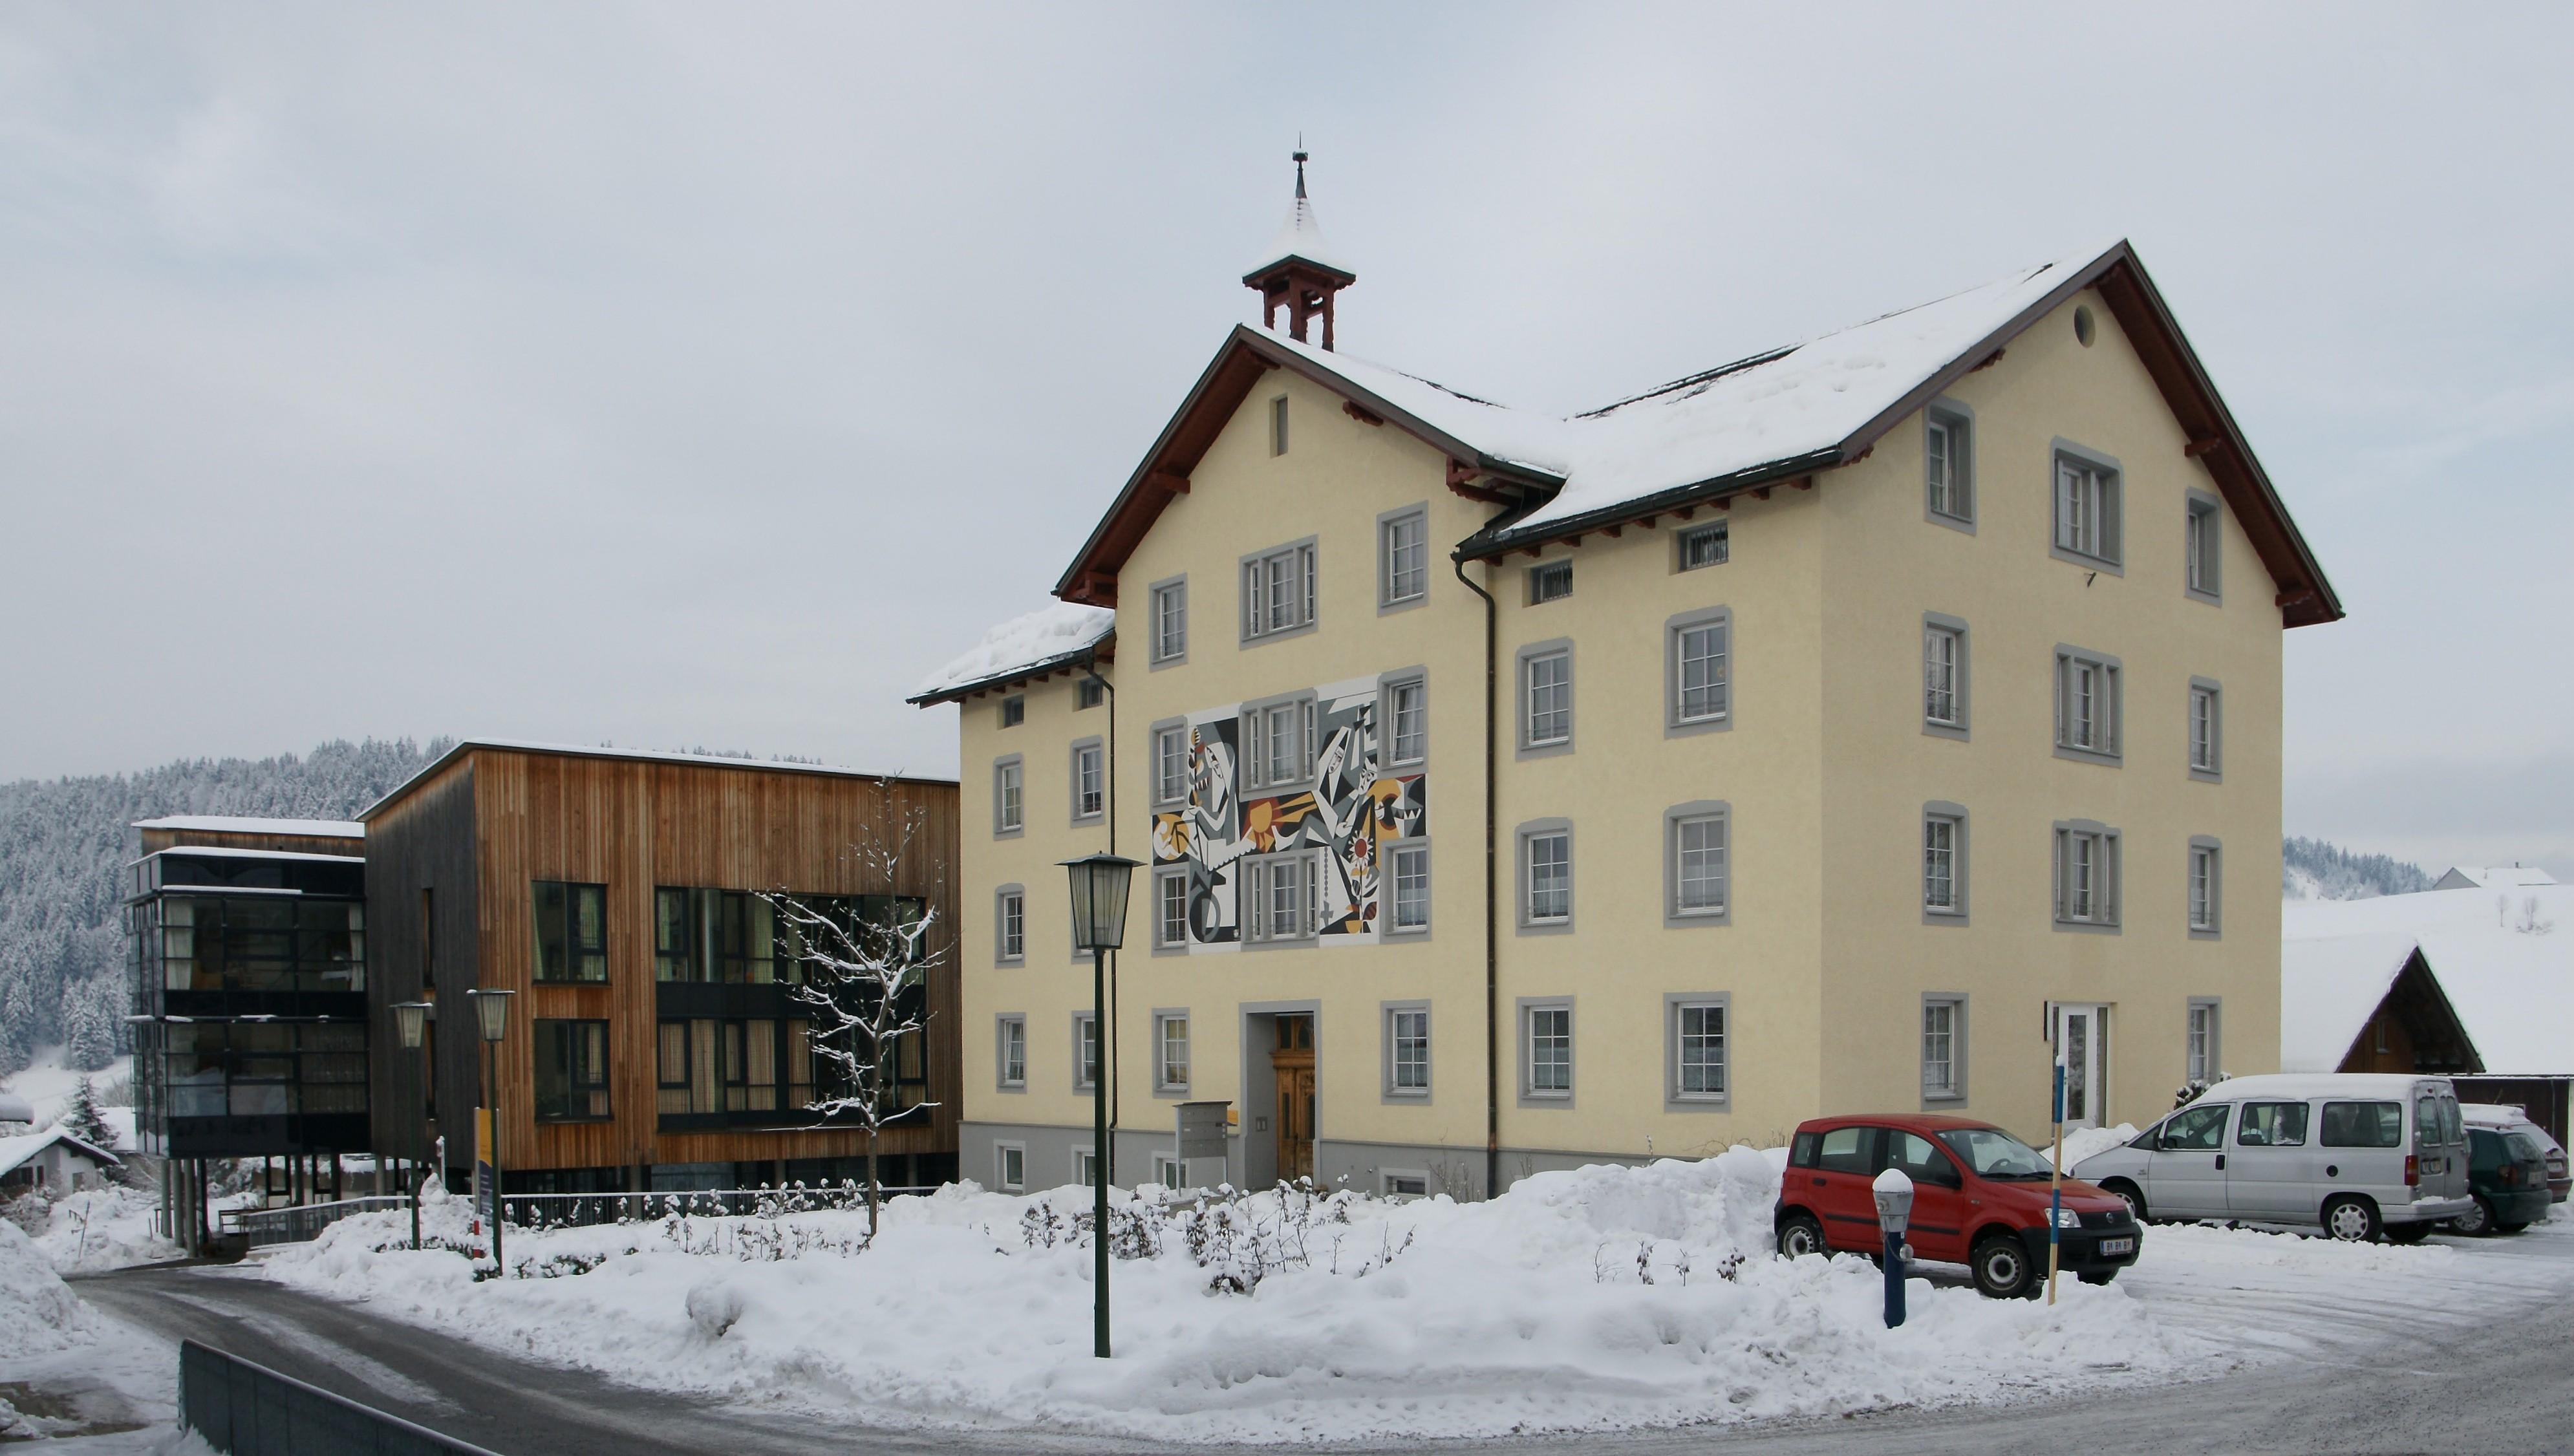 Die Grnen Vorarlberg - Alberschwende - Grne Vorarlberg